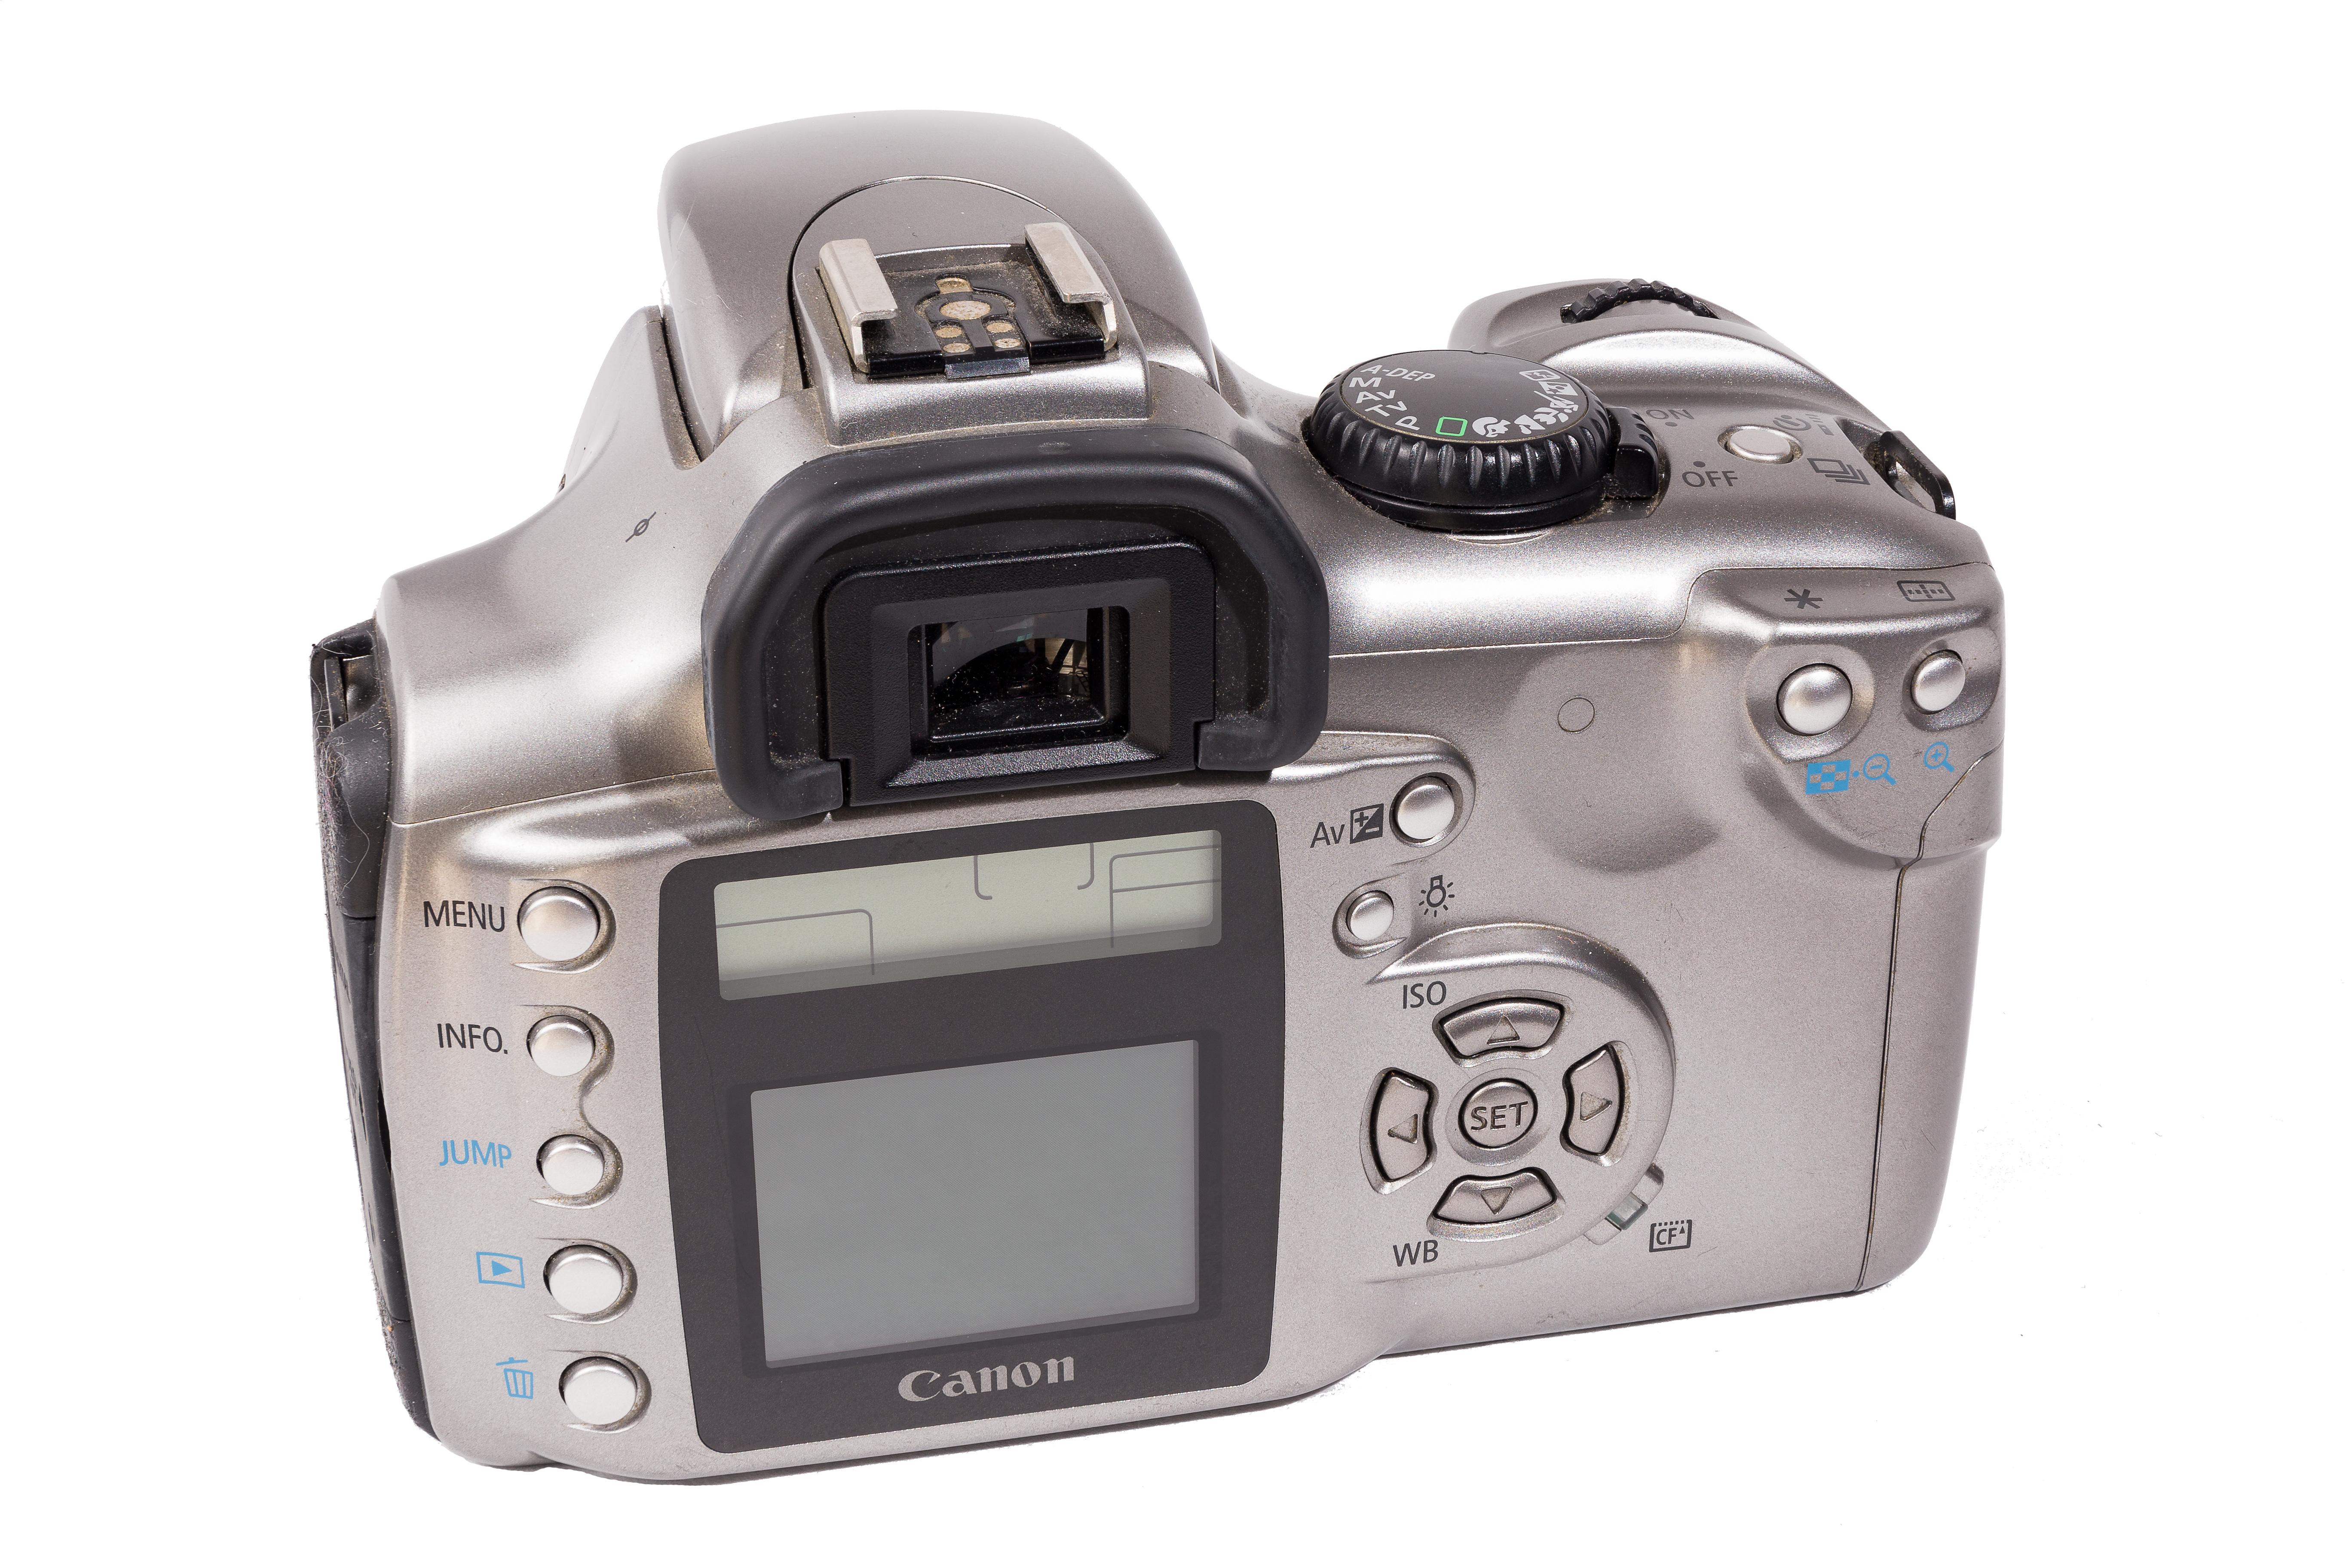 File:Canon EOS 300D, Back, 1803181545, ako.jpg